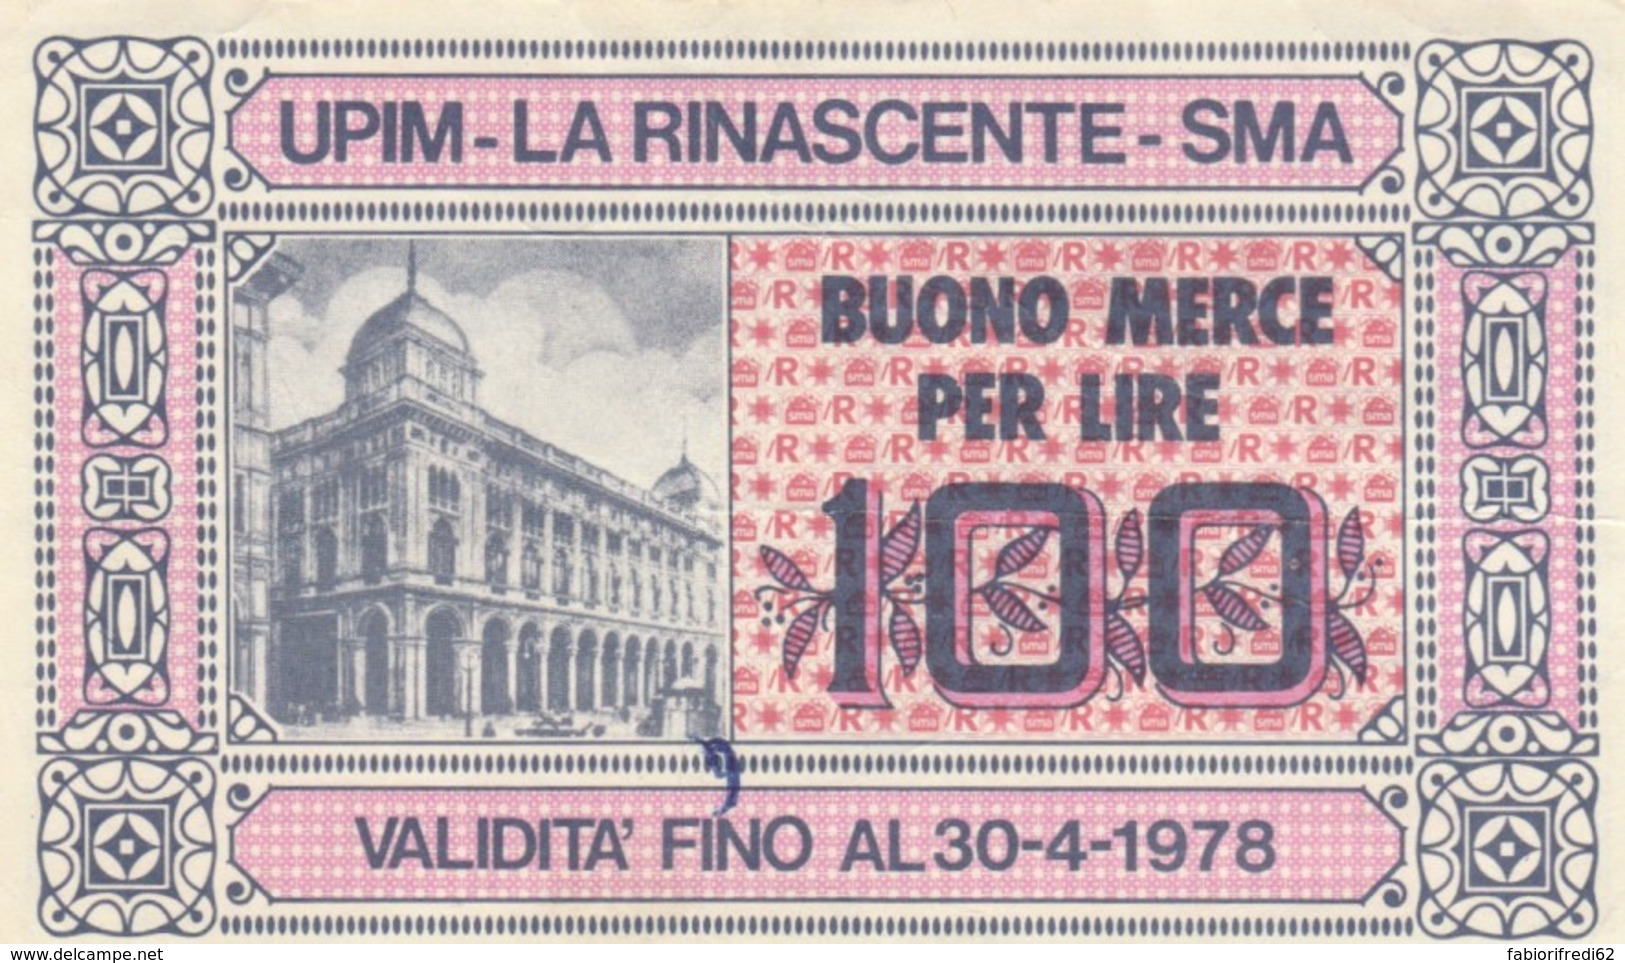 BUONO MERCE 100 LIRE UPIM LA RINASCENTE (VX1584 - [10] Assegni E Miniassegni